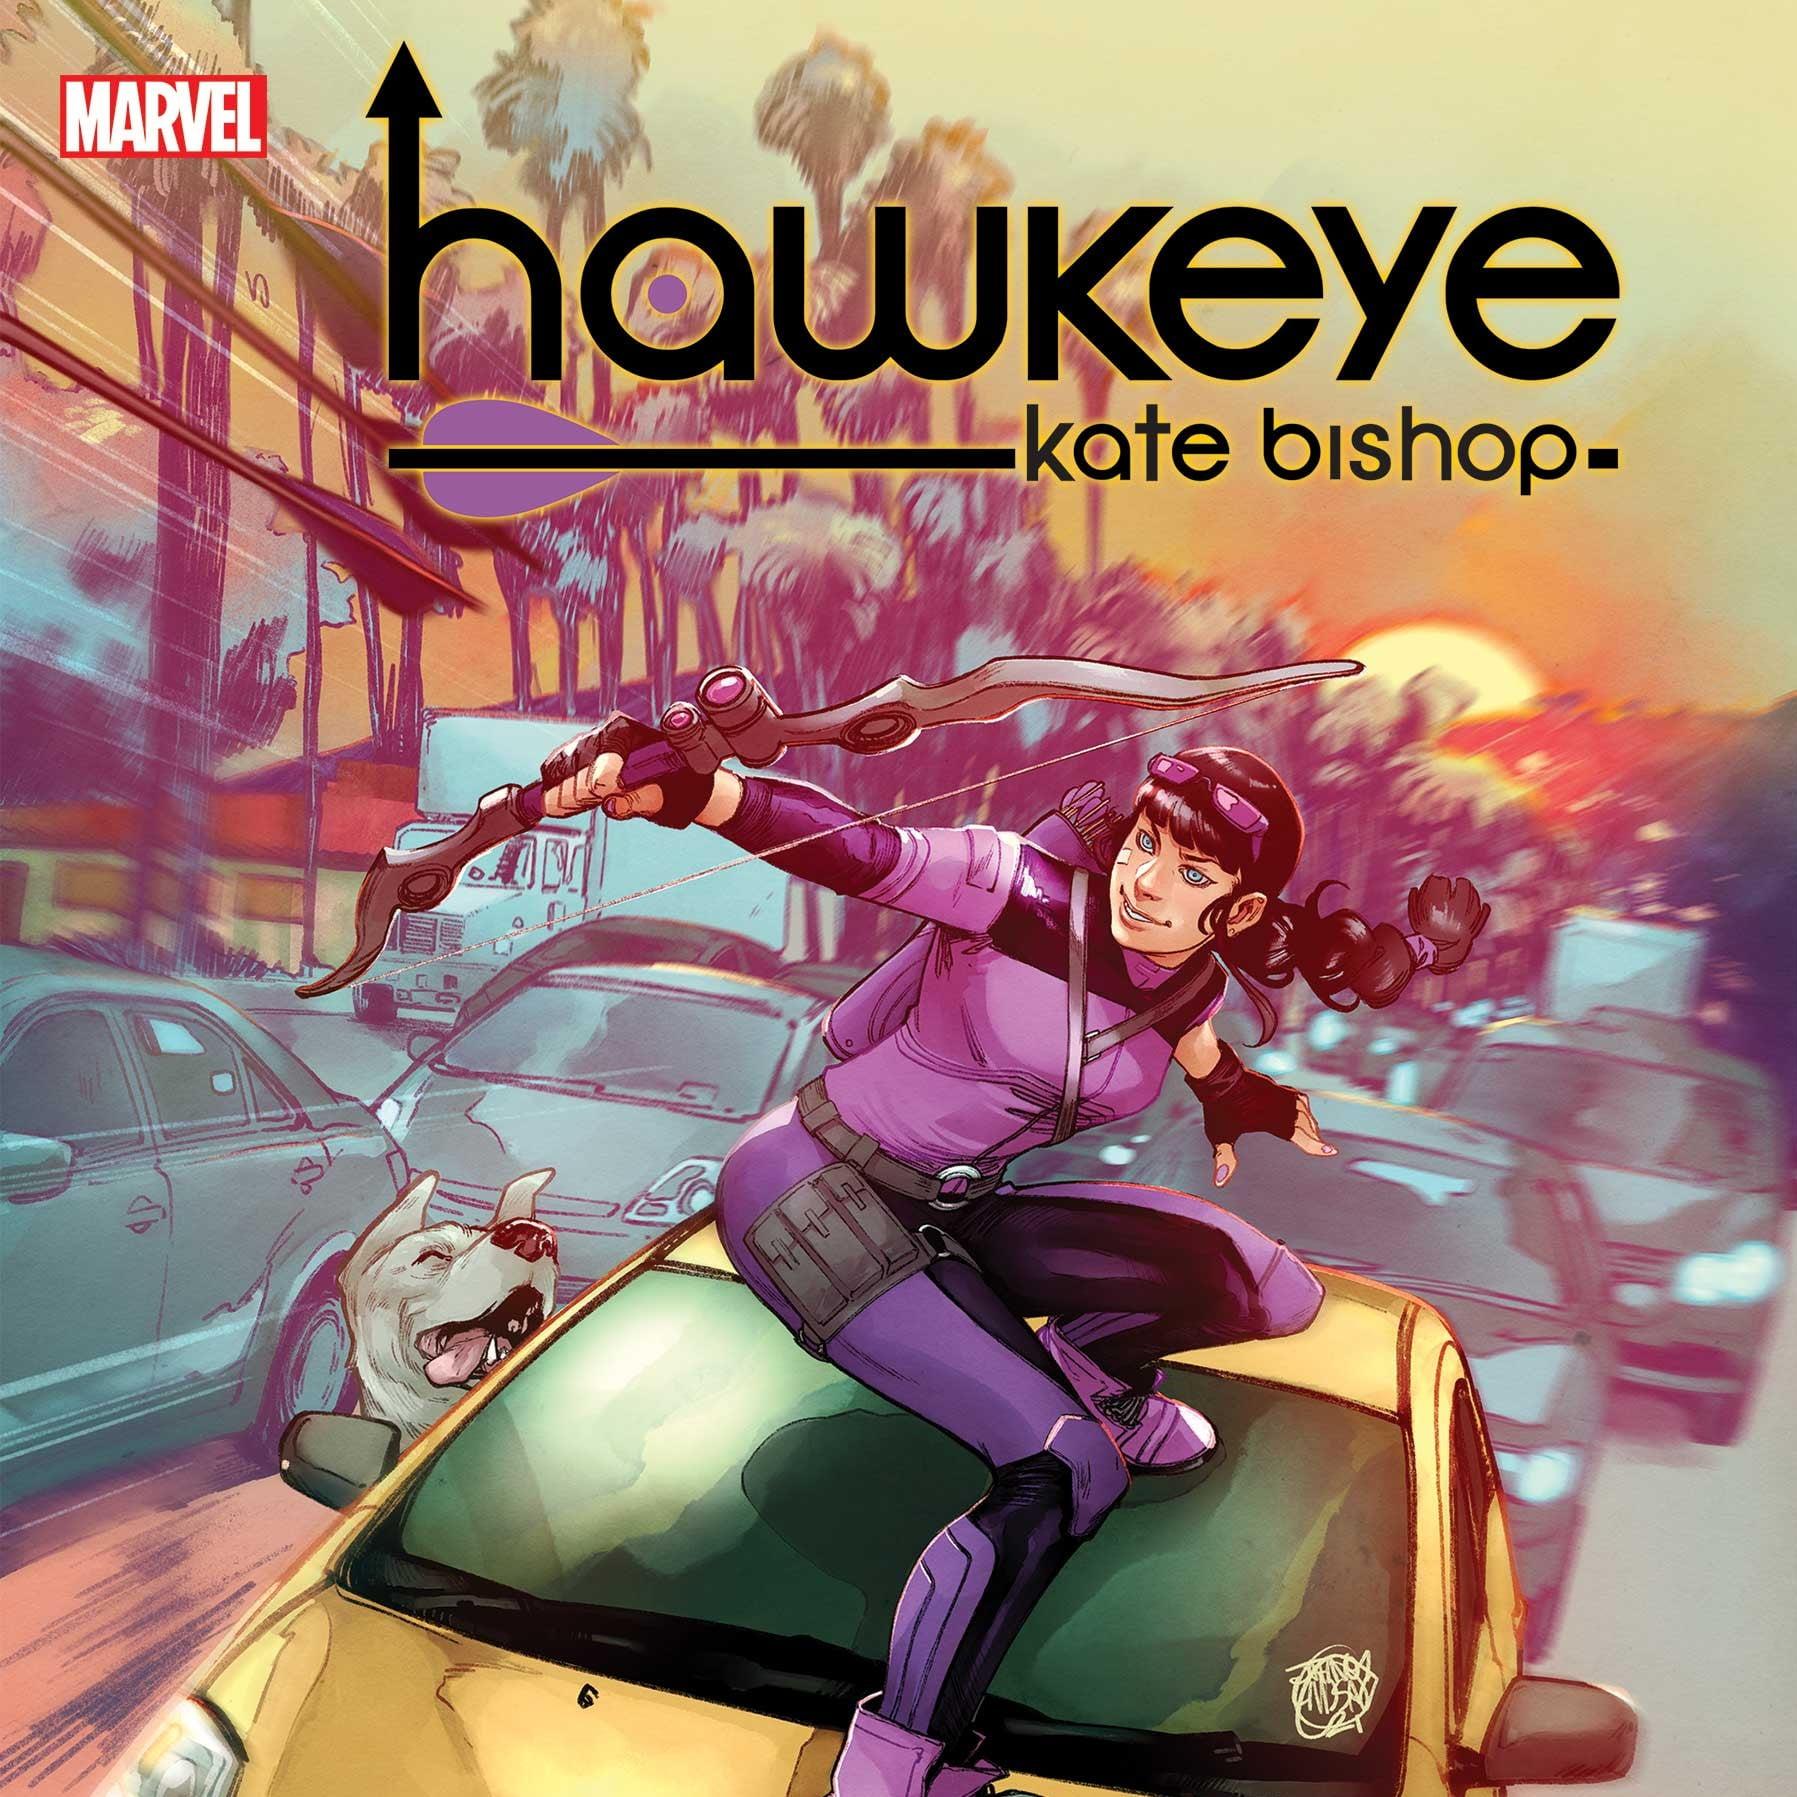 Hawkeye via Jahnoy Lindsay for Marvel Comics for use by 360 Magazine